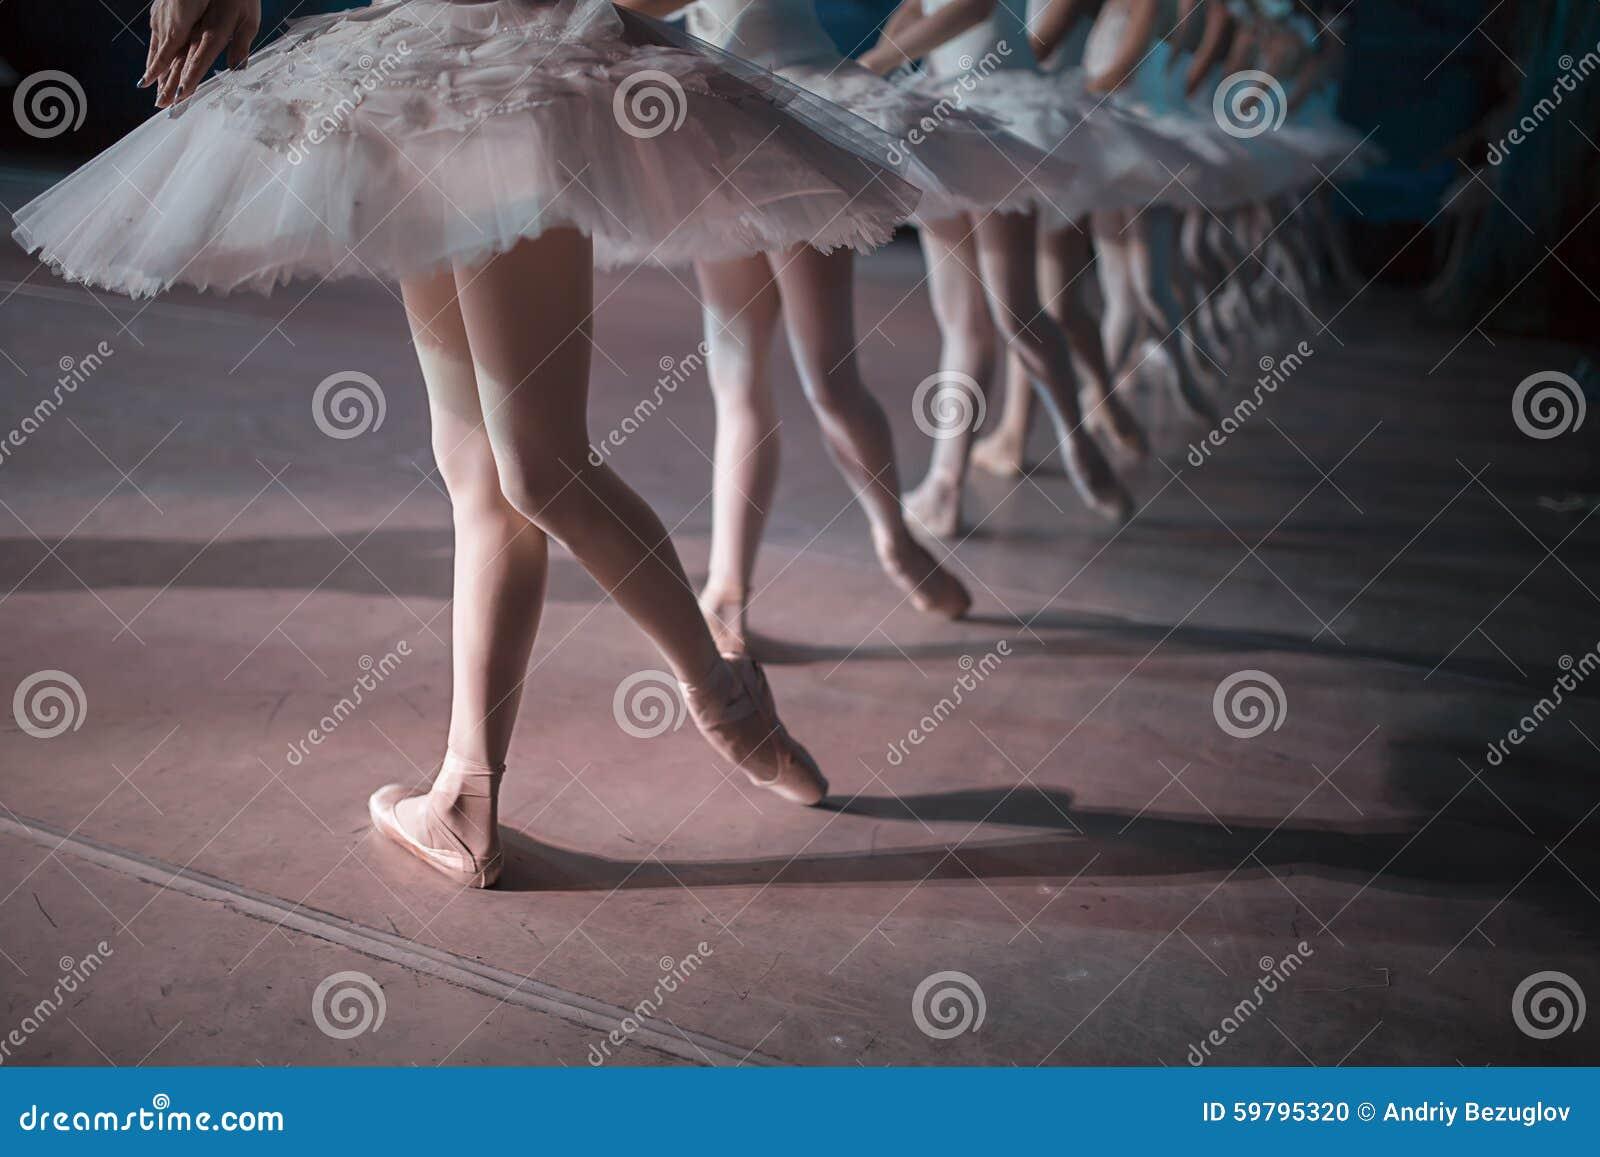 Dançarinos tutu branco na dança sincronizada